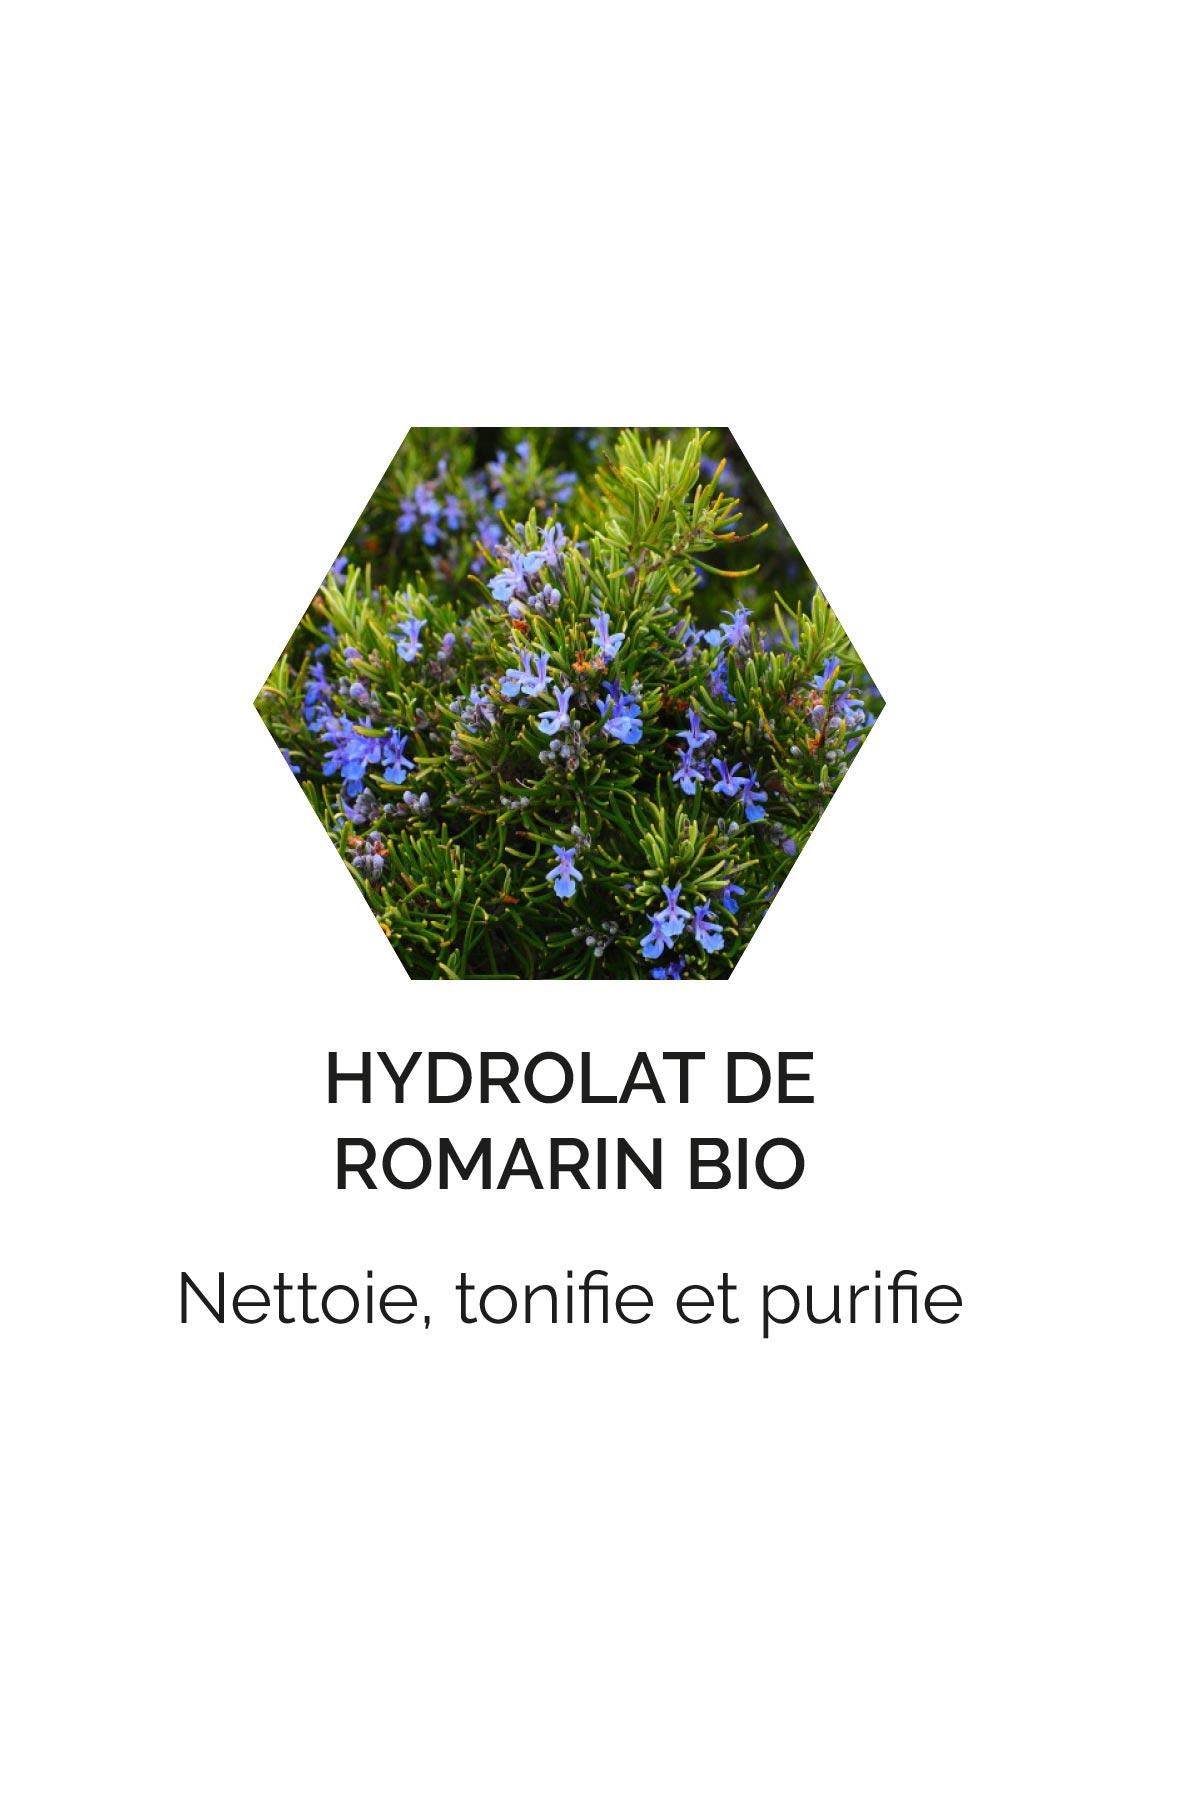 Hydrolat de romarin bio